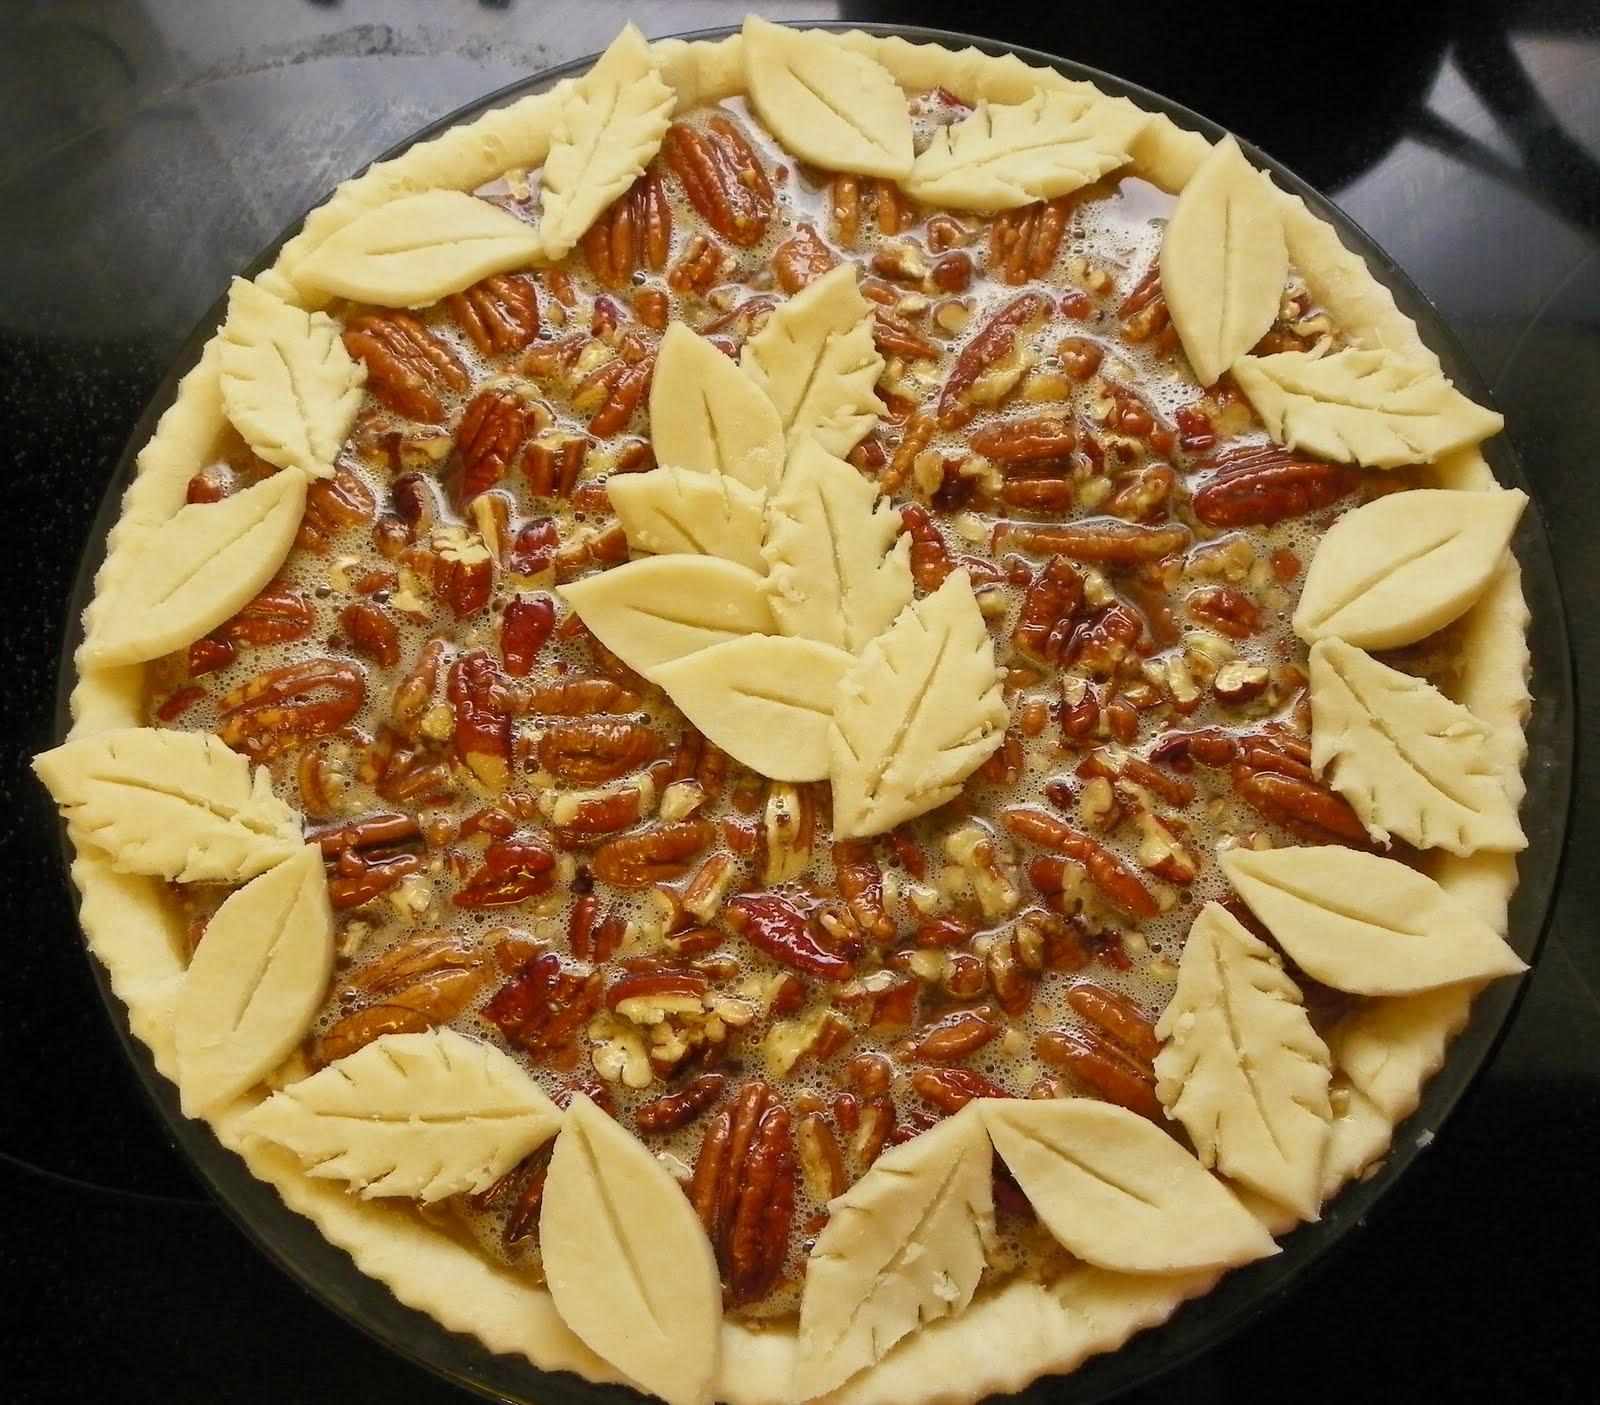 Having Fun In The Kitchen!: Thanksgiving Pies